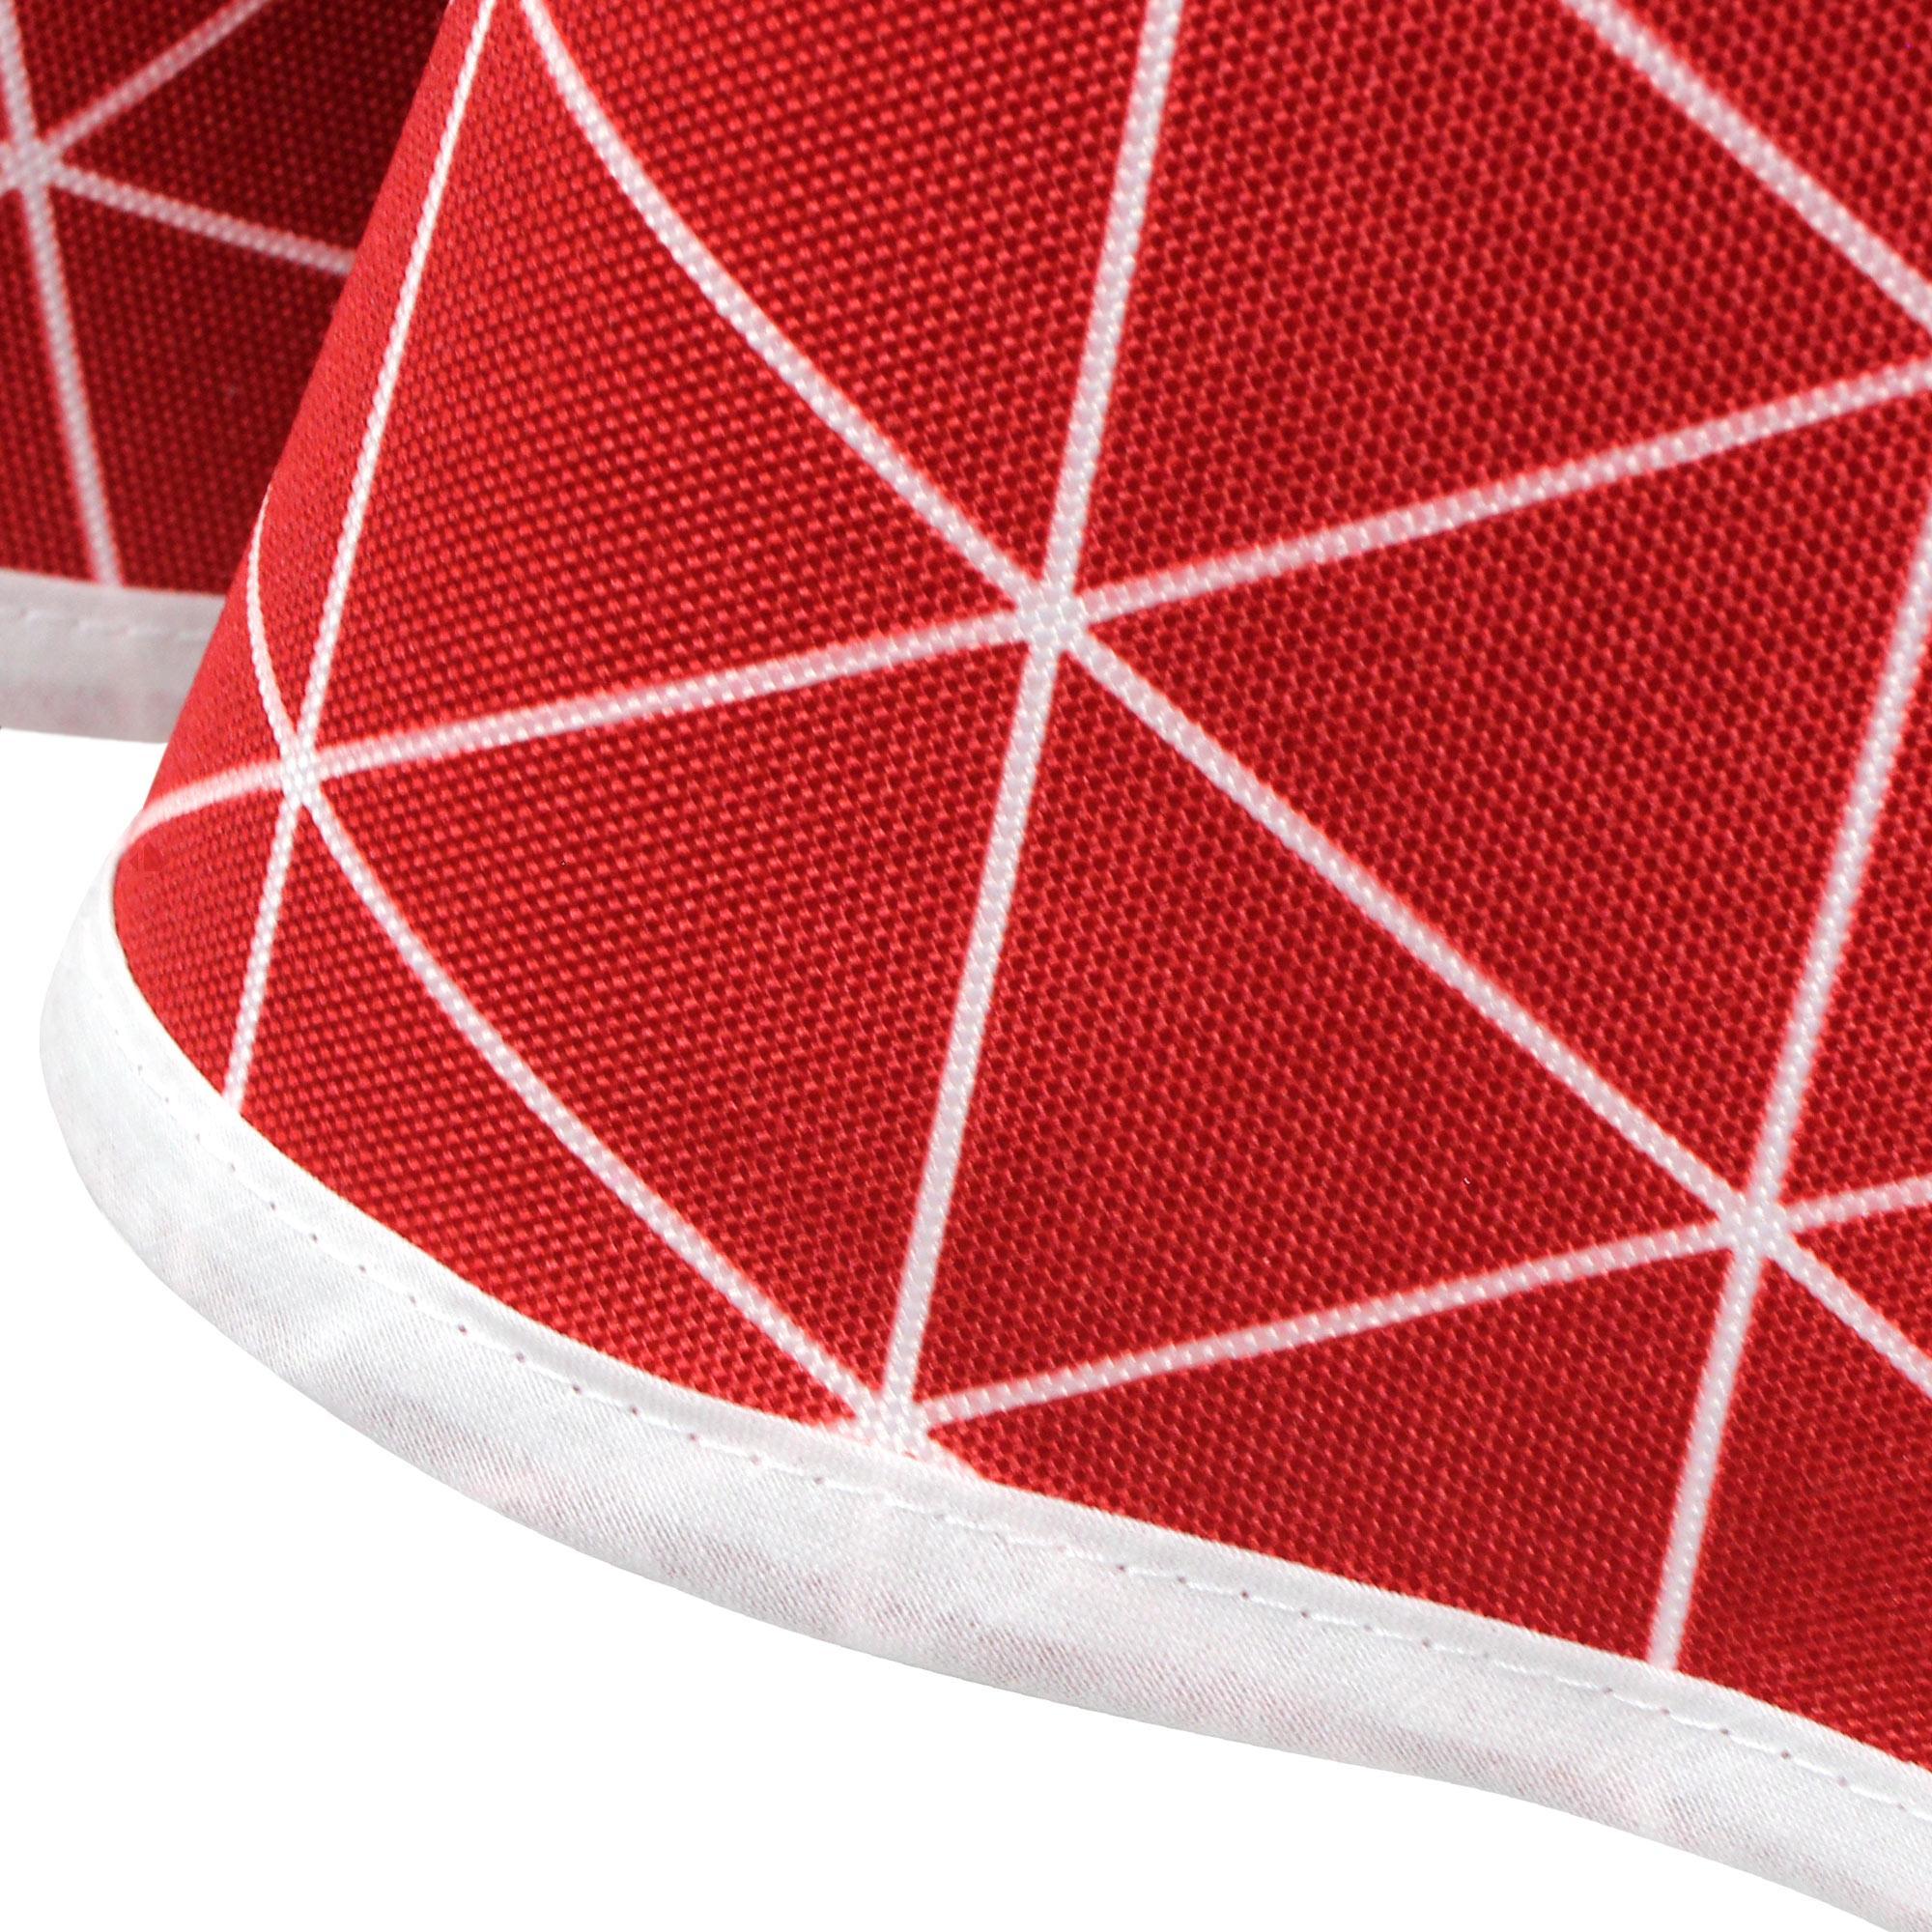 nappe ovale 180x240 cm imprim e 100 polyester paco g om trique rouge cerise linnea linge de. Black Bedroom Furniture Sets. Home Design Ideas